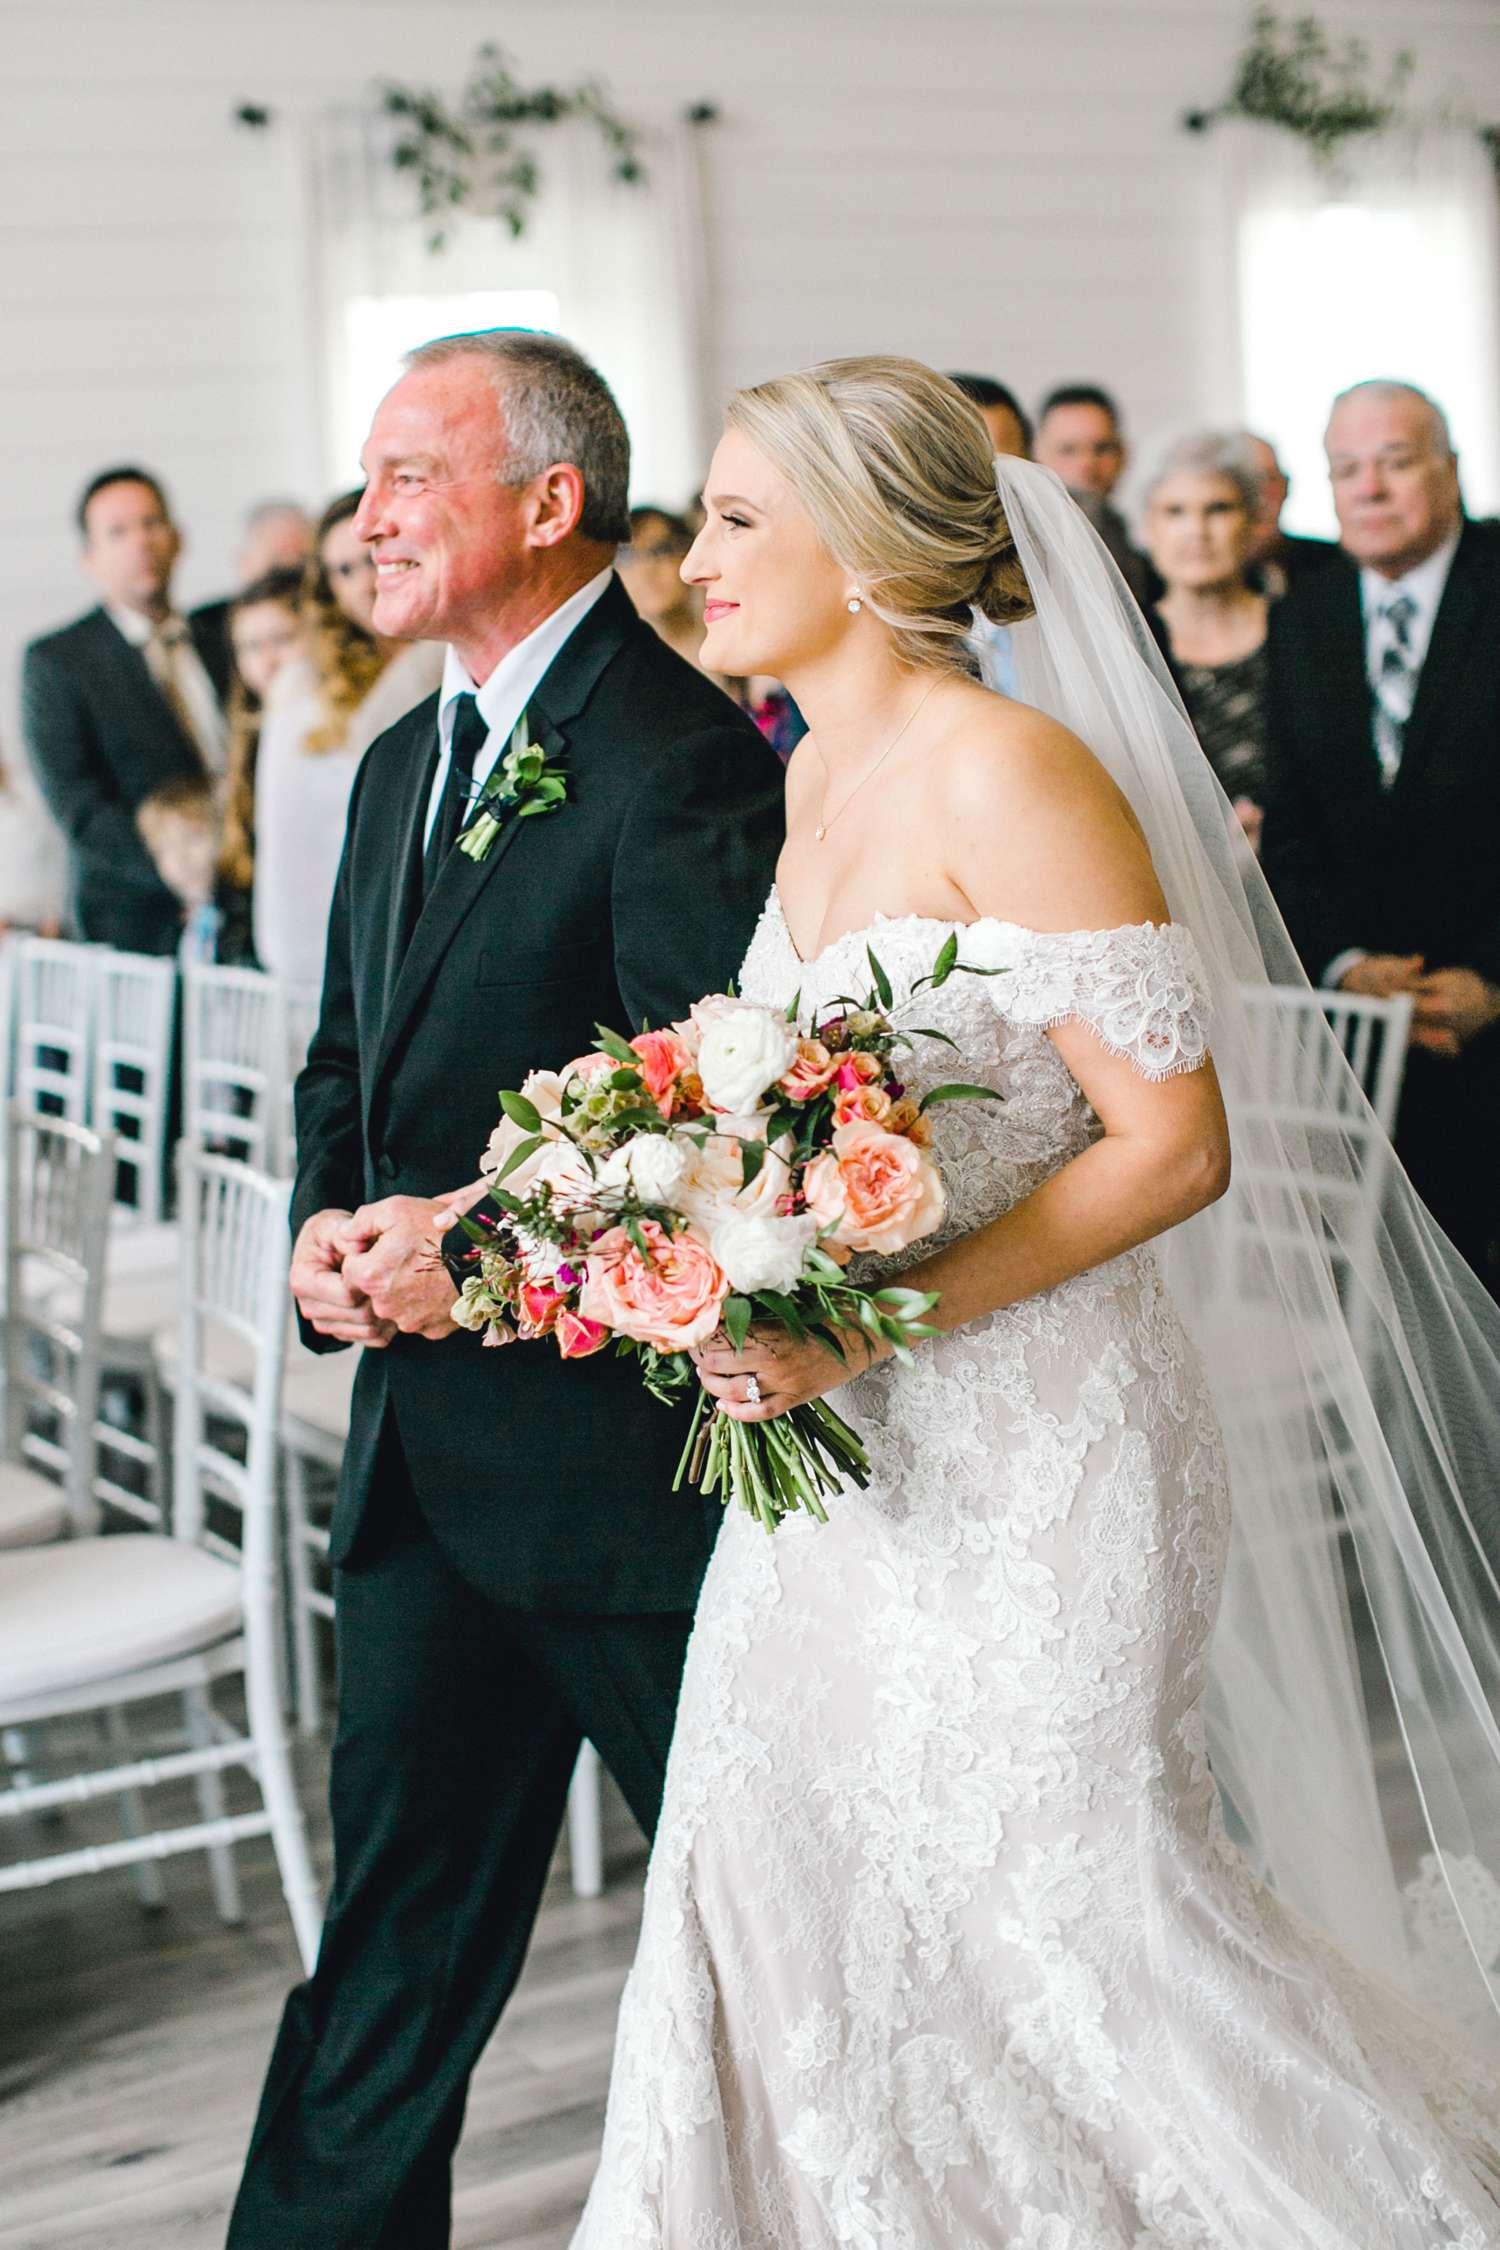 HEBERT_MORGAN_AND_CLAY_ALLEEJ_THE_FARMHOUSE_MONTGOMERY_TEXAS_WEDDING_0082.jpg